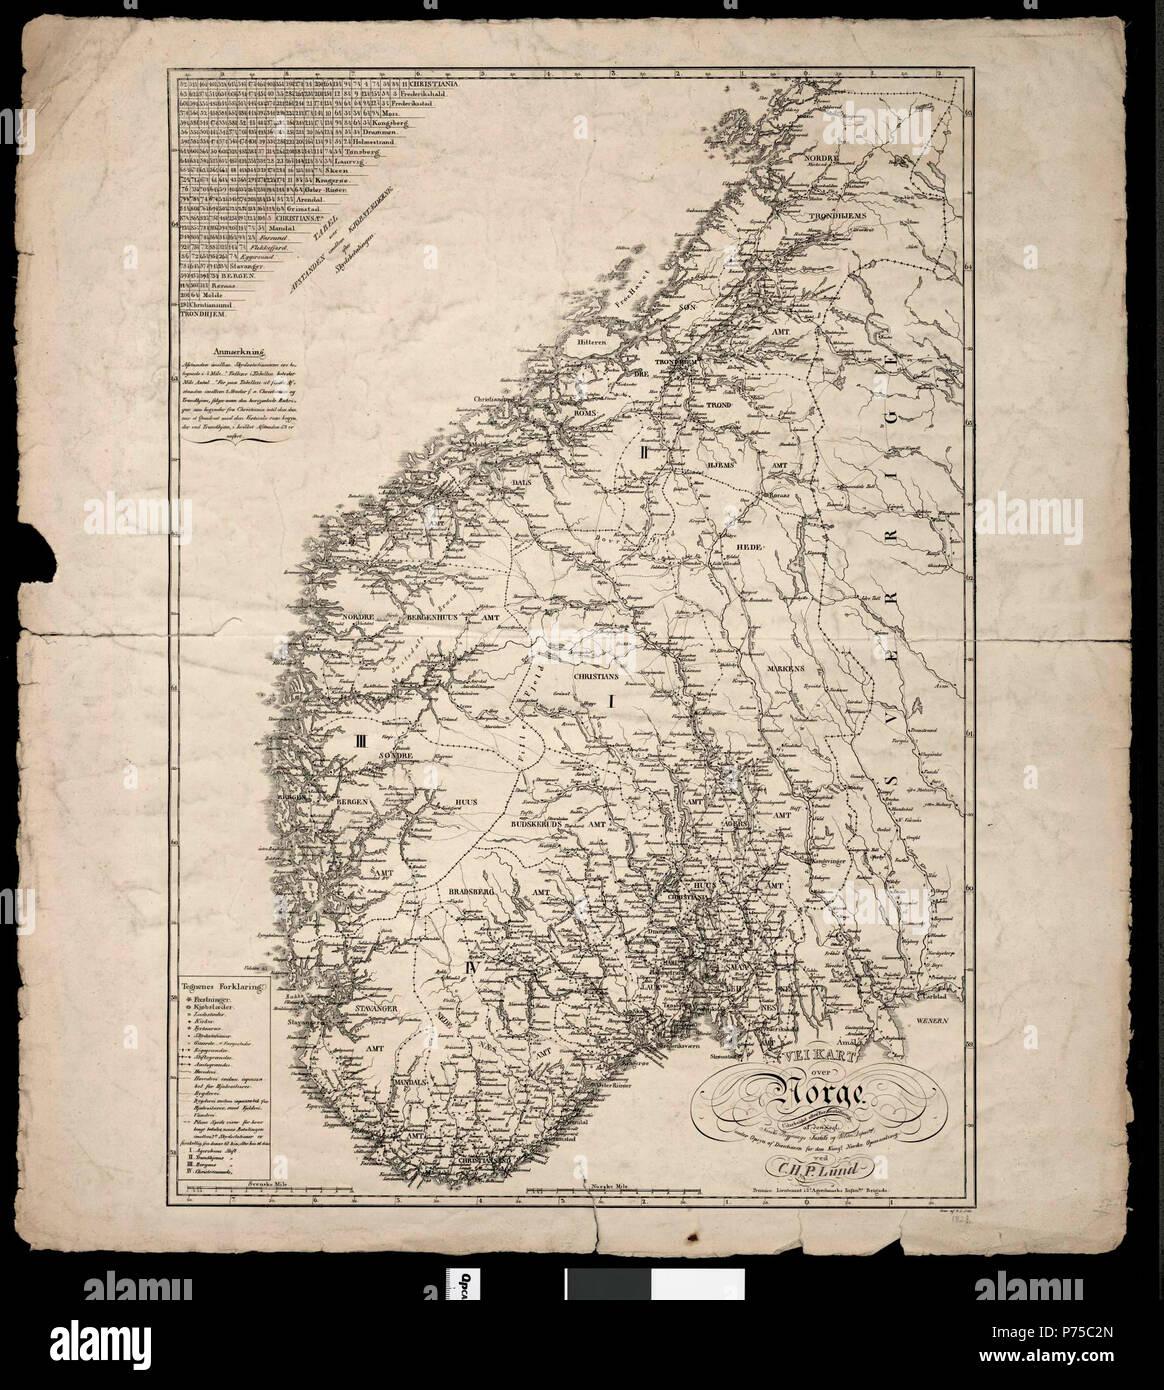 veikart kart norge Veikart over Norge   Cartographer H.C.P. Lund ca 1824 1847 Stock  veikart kart norge